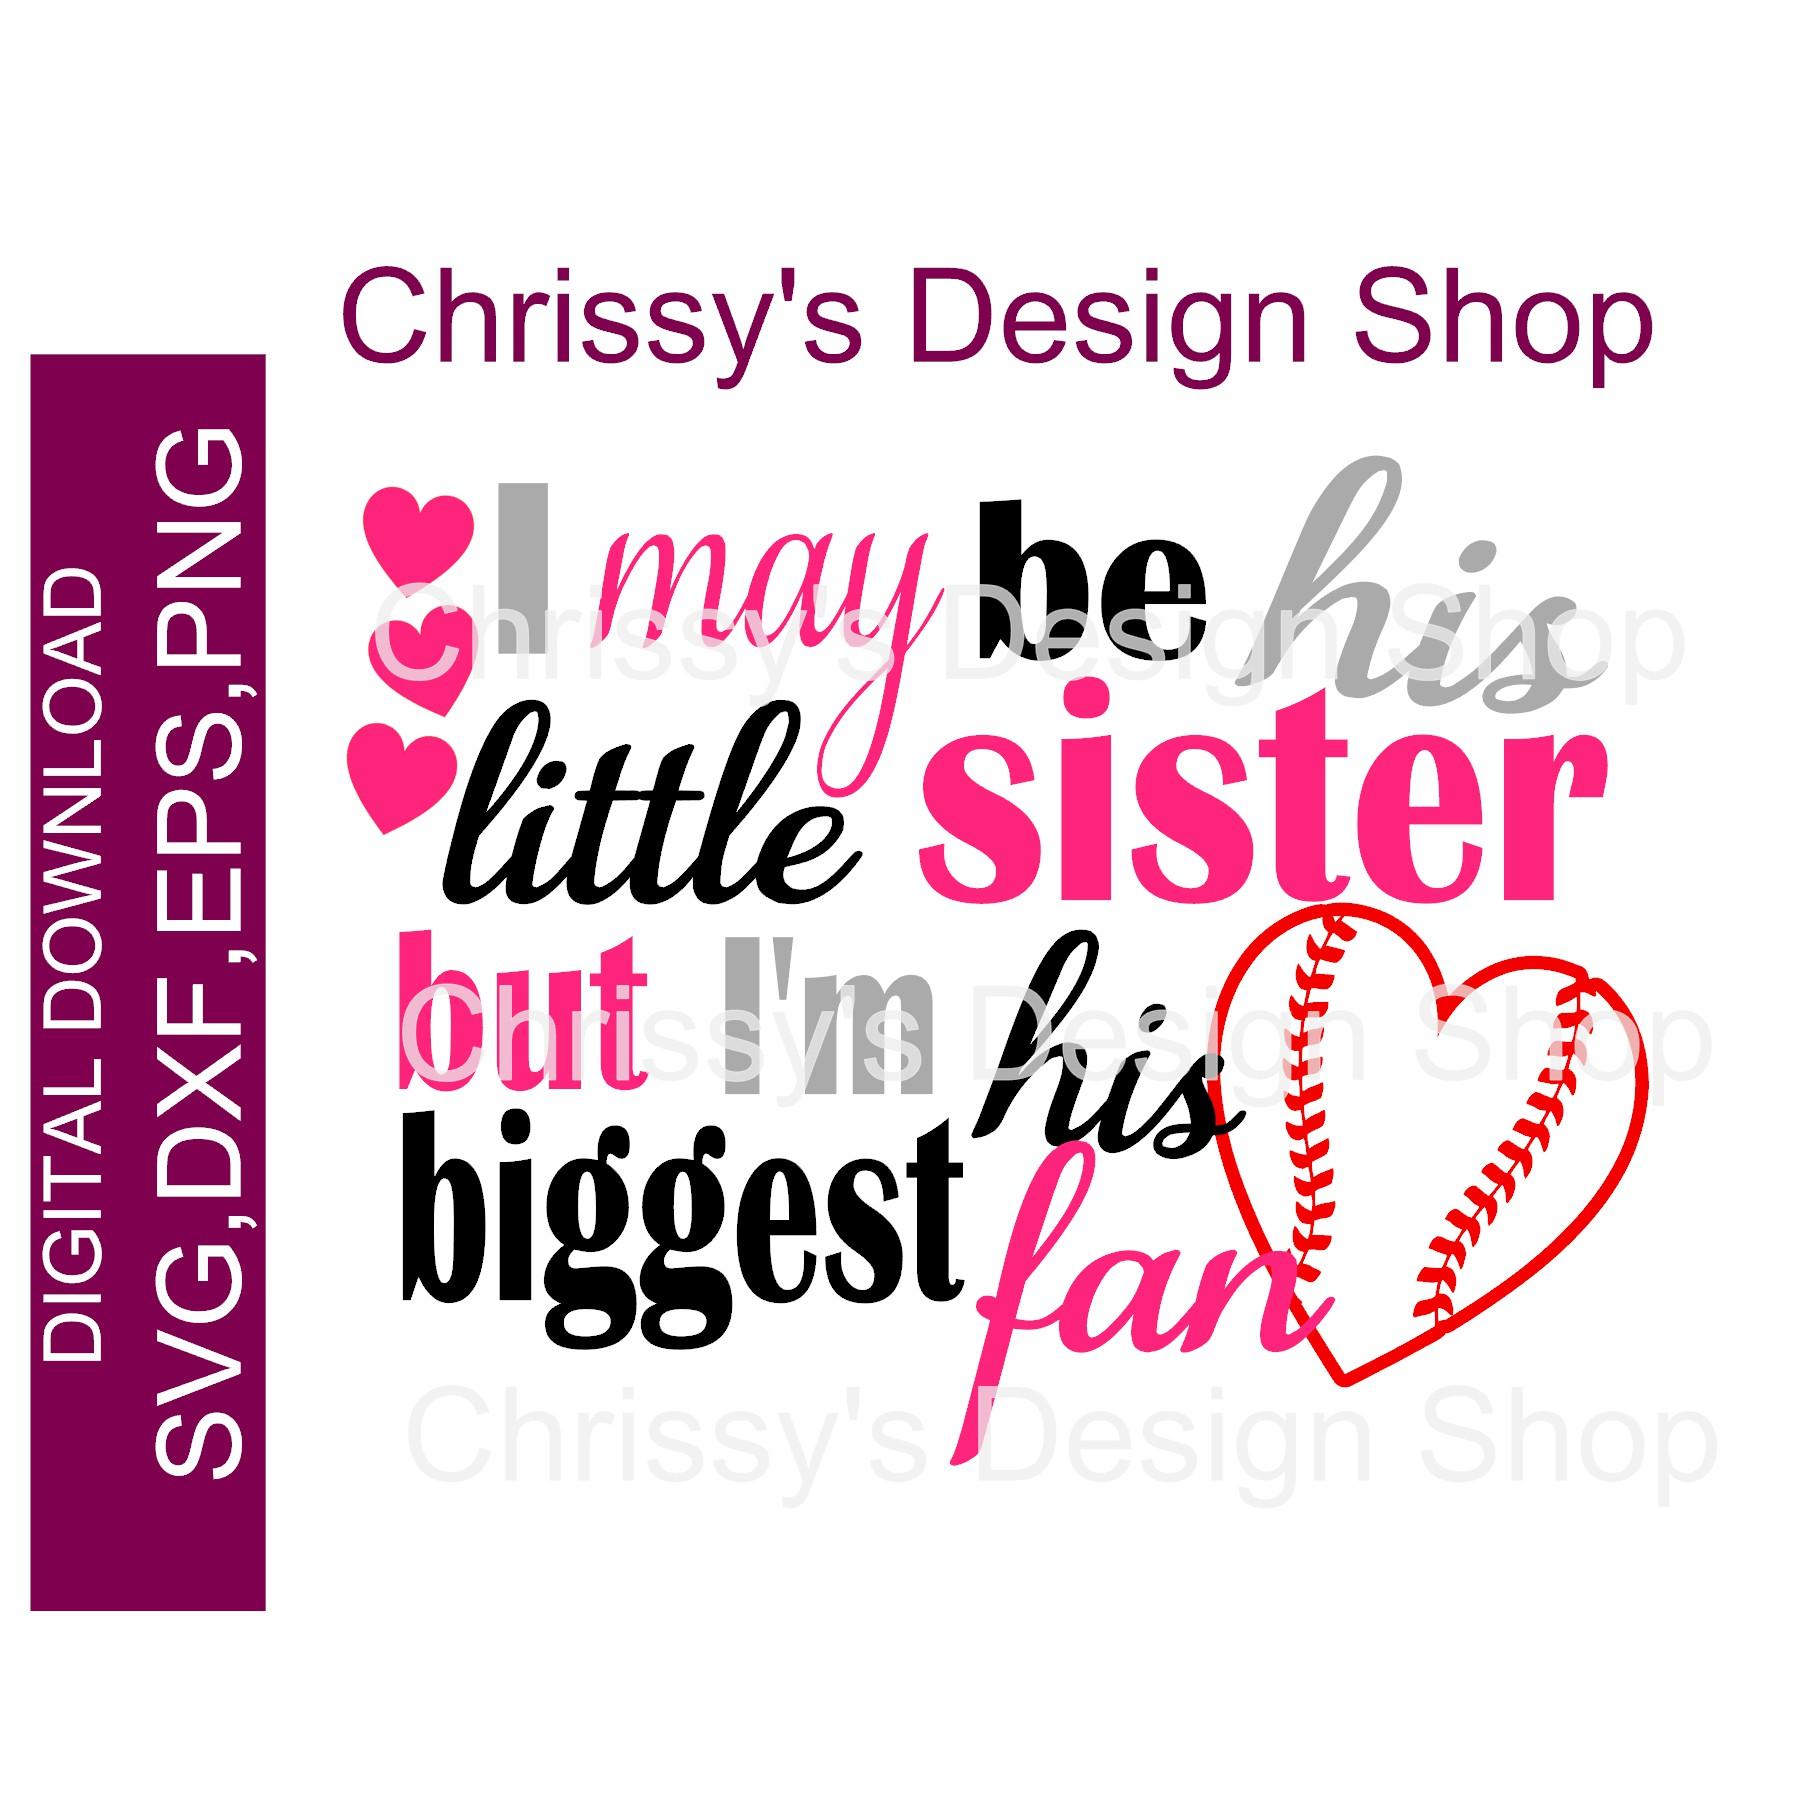 Little Sister Baseball Fan Svg Dxf Eps Chrissy S Design Shop